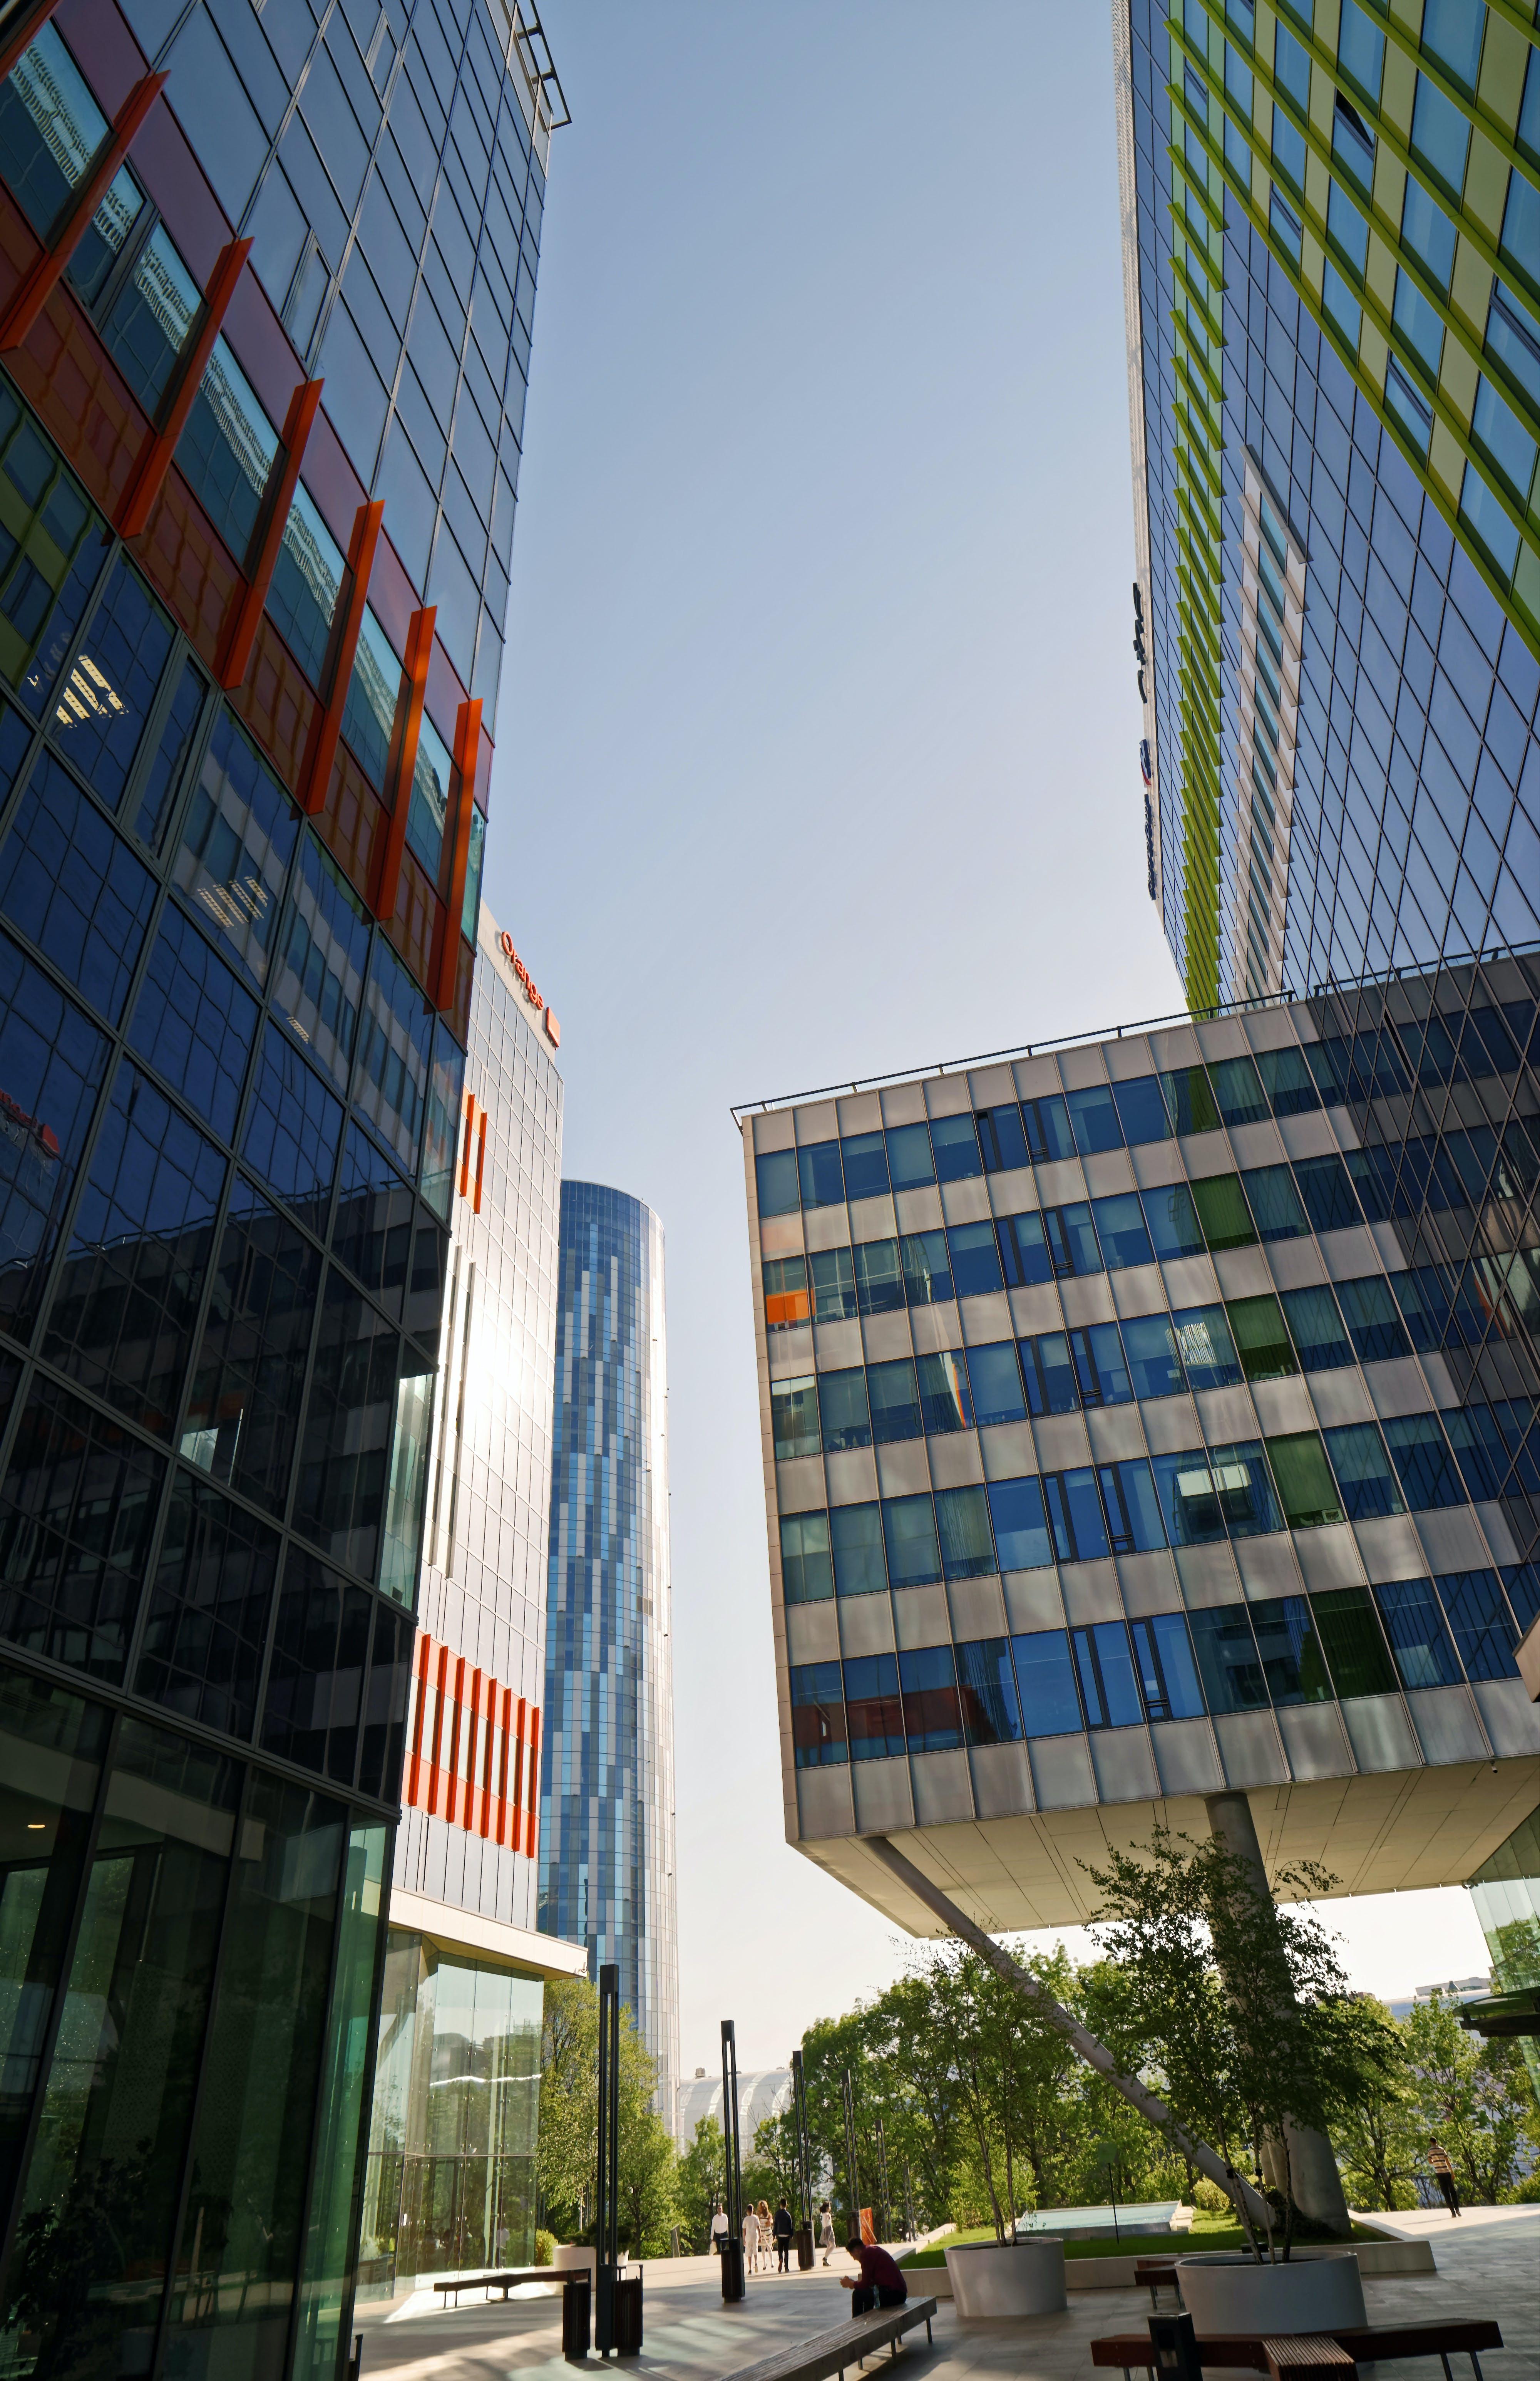 Blue High-rise Buildings